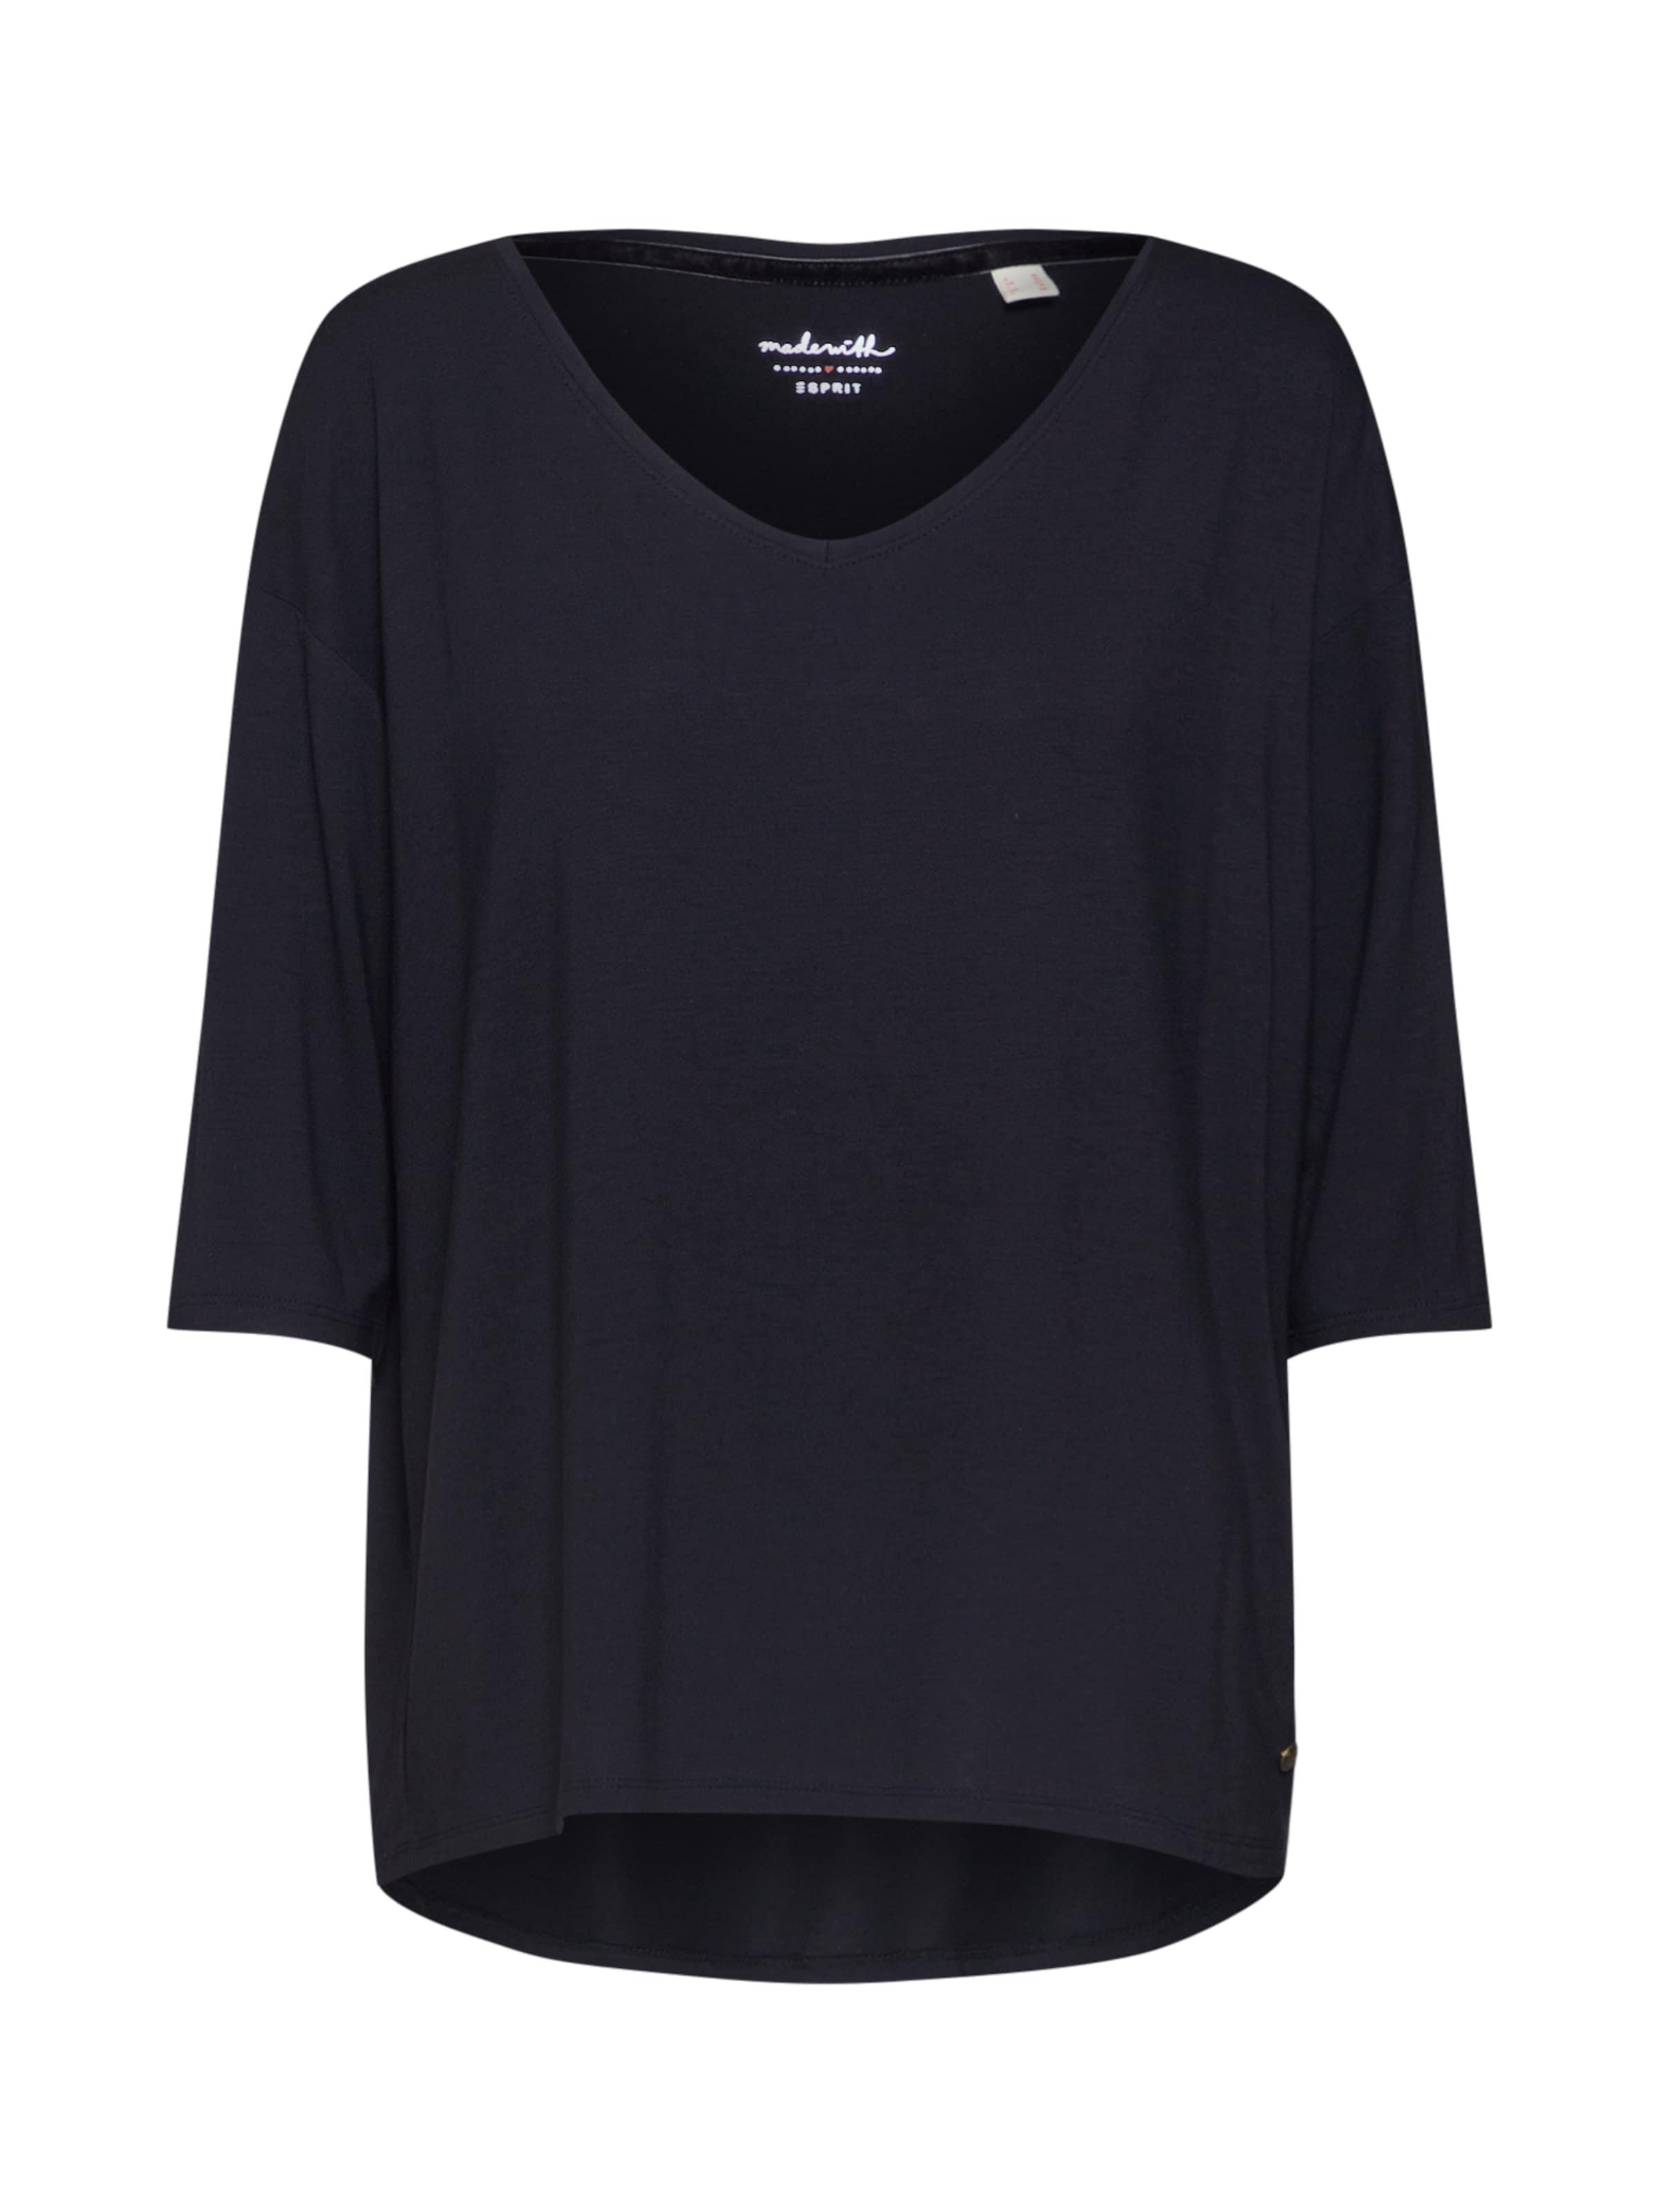 shirt En Noir T 'noos' Esprit D9e2WEYHI